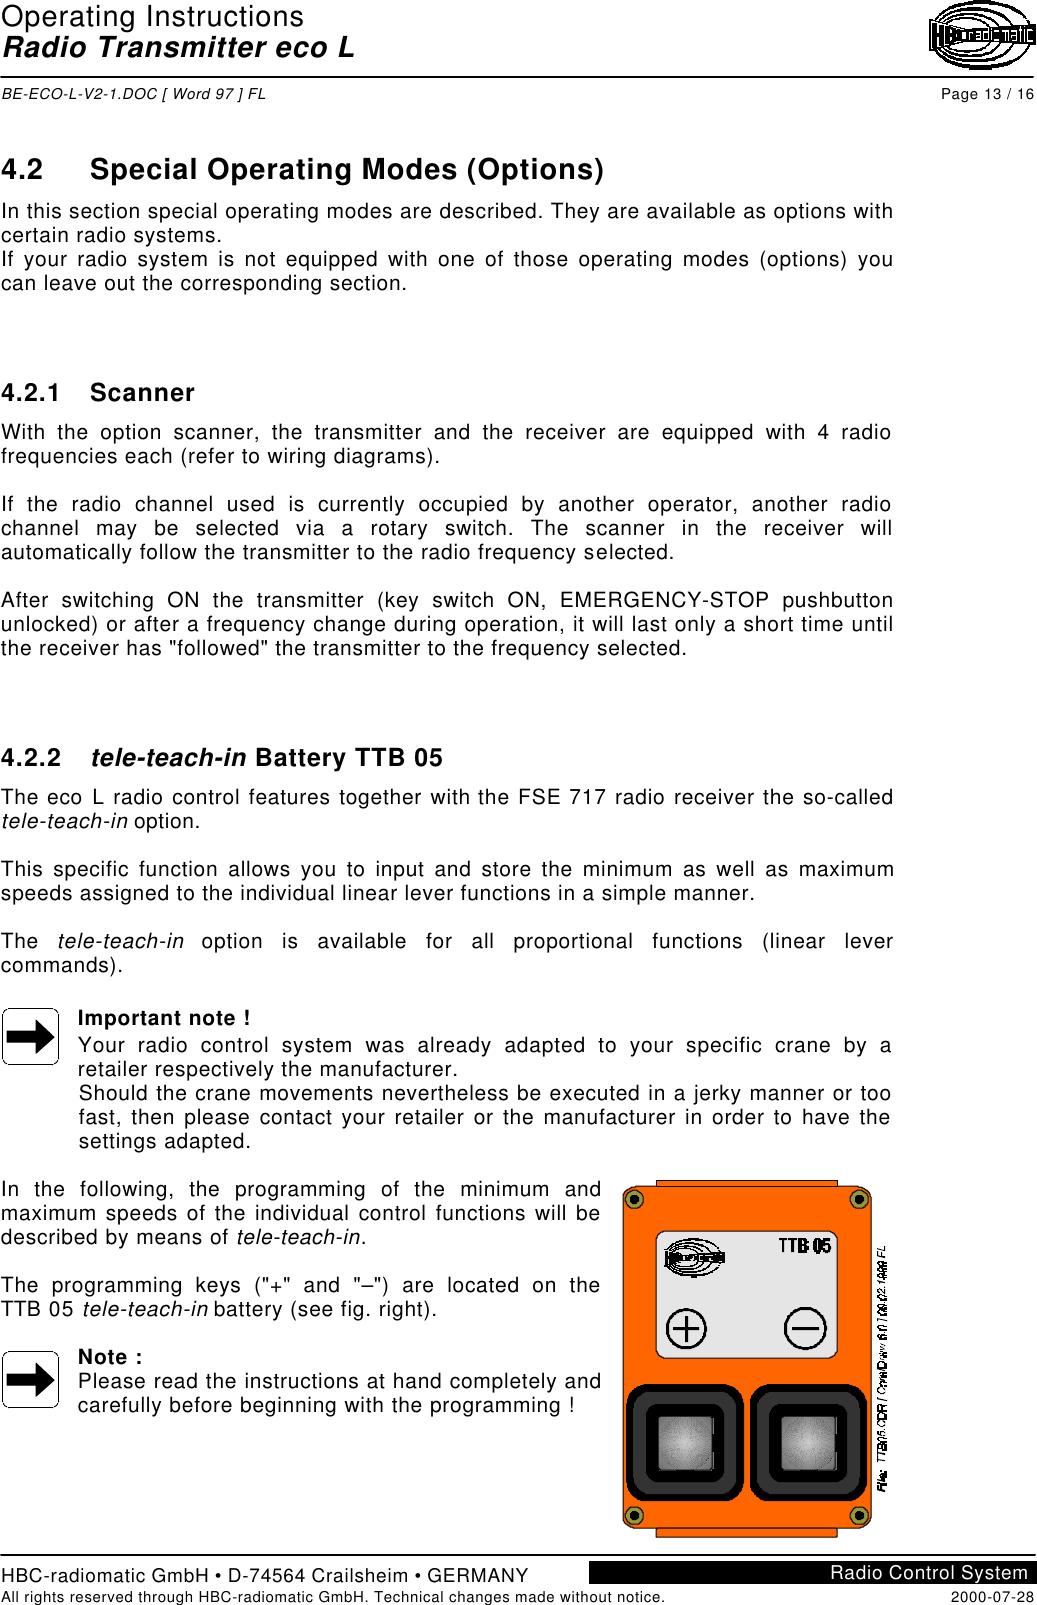 HBC radiomatic E20004 Crane Remote Control Transmitter User